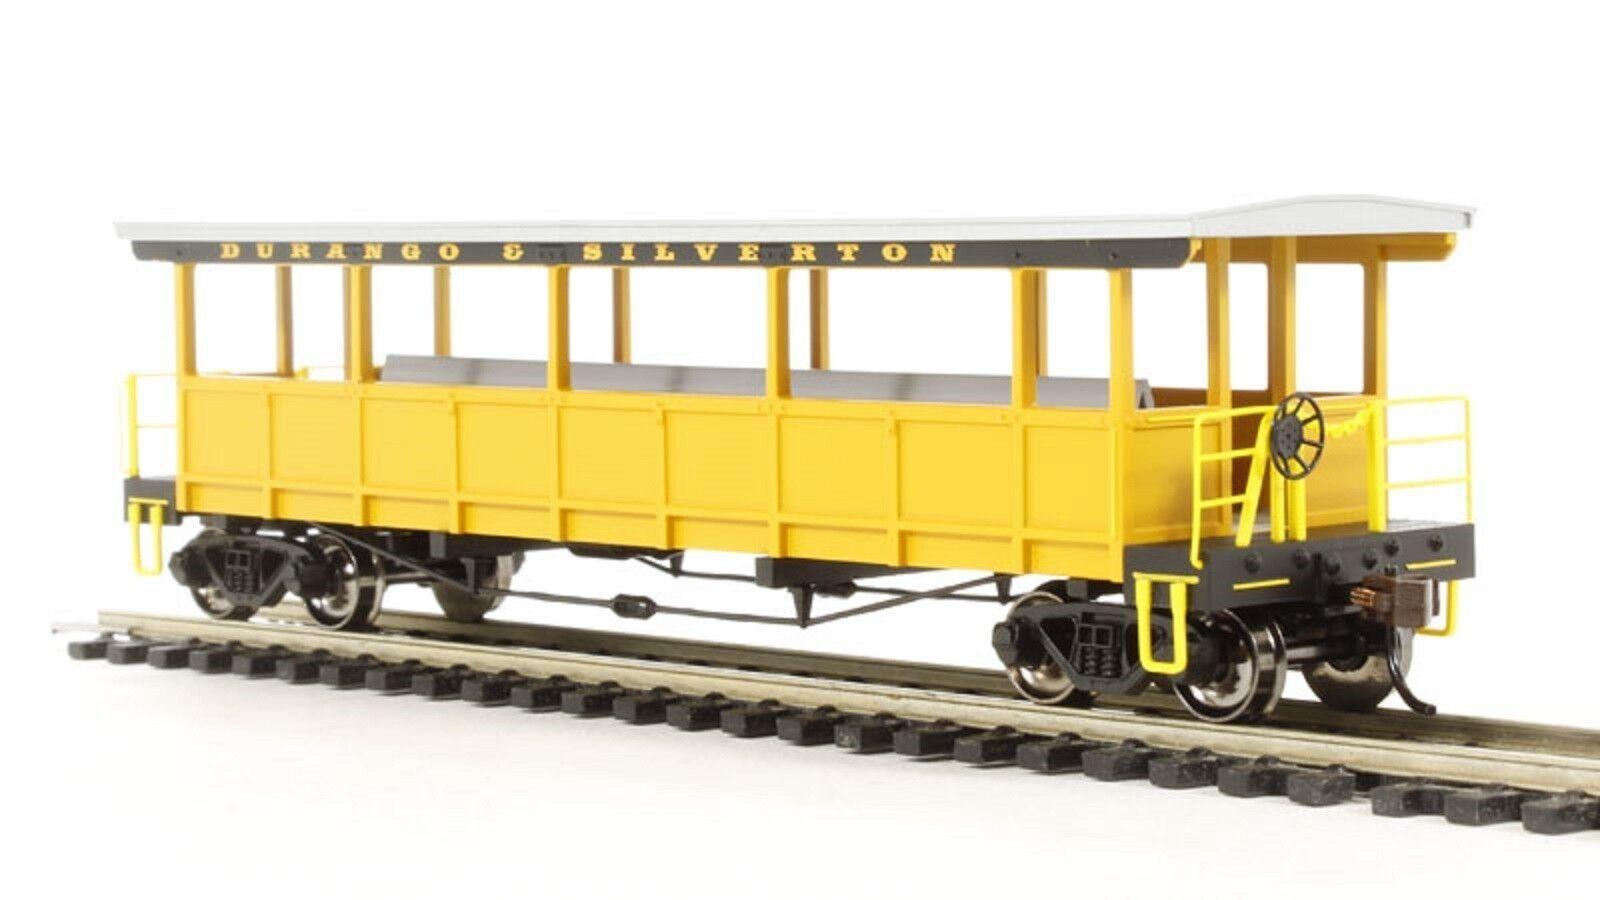 17432 Wagon DURANGO Voiture Passager proessiadeBachuomon Train HO 187